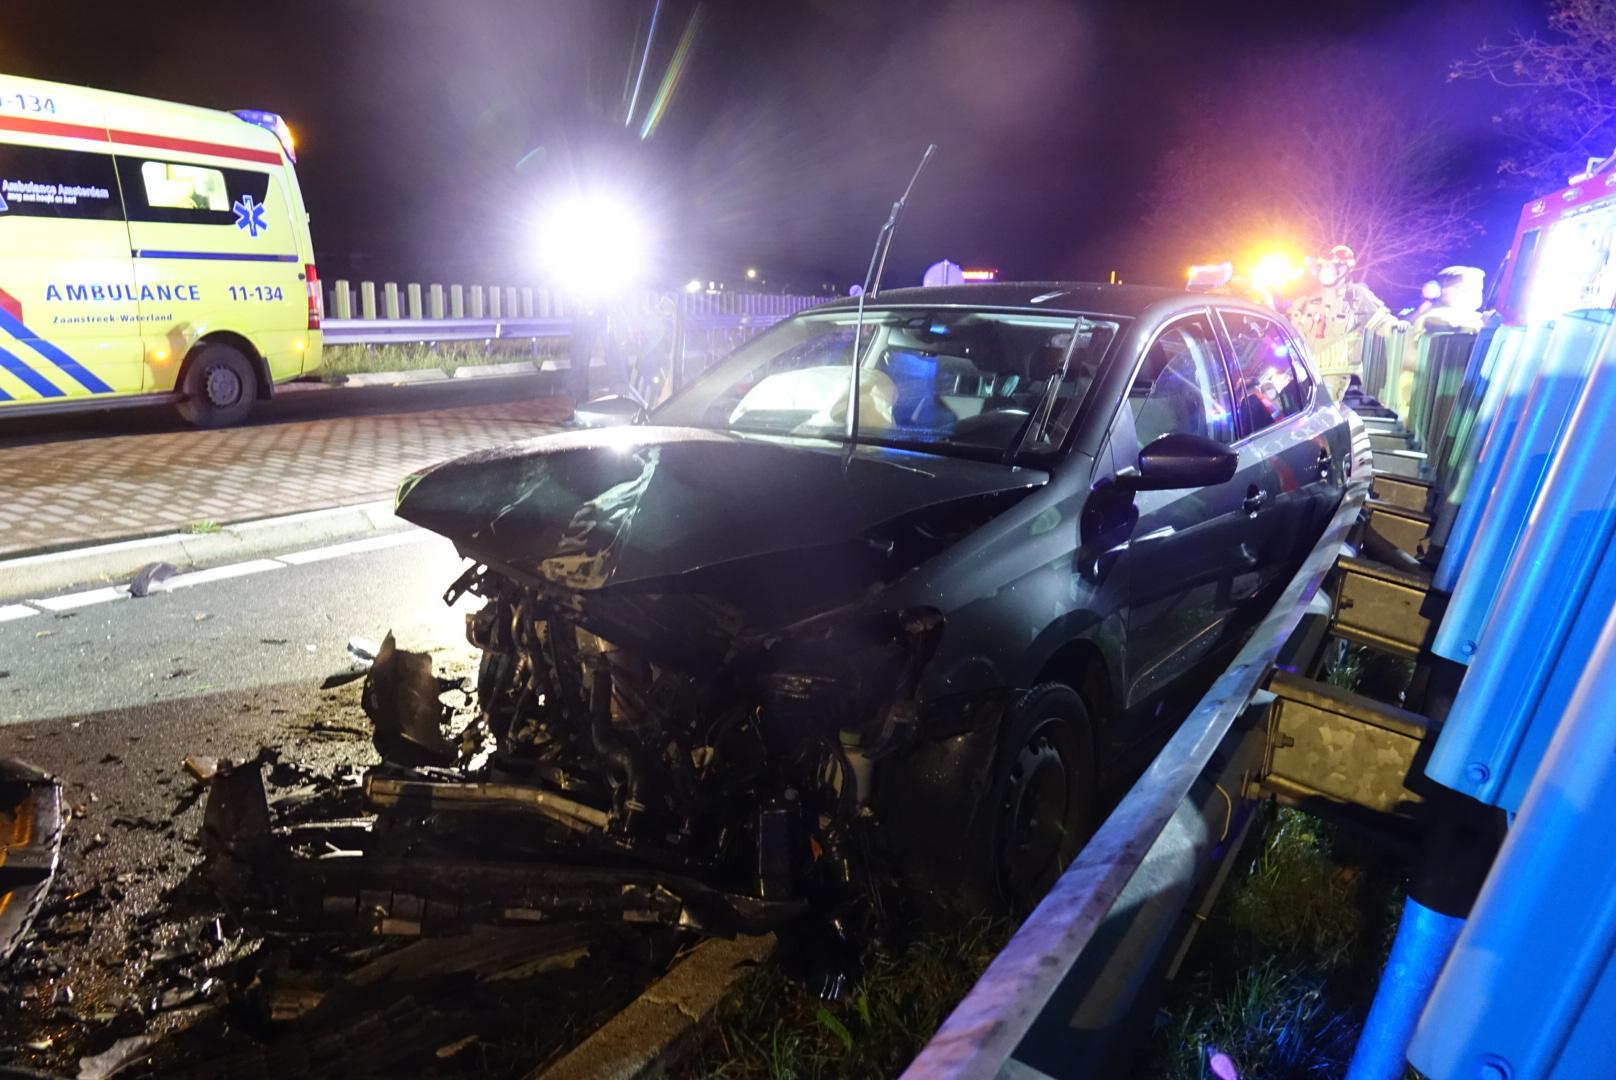 Frontale botsing op Jaagweg in Ilpendam; auto's total loss en twee gewonden